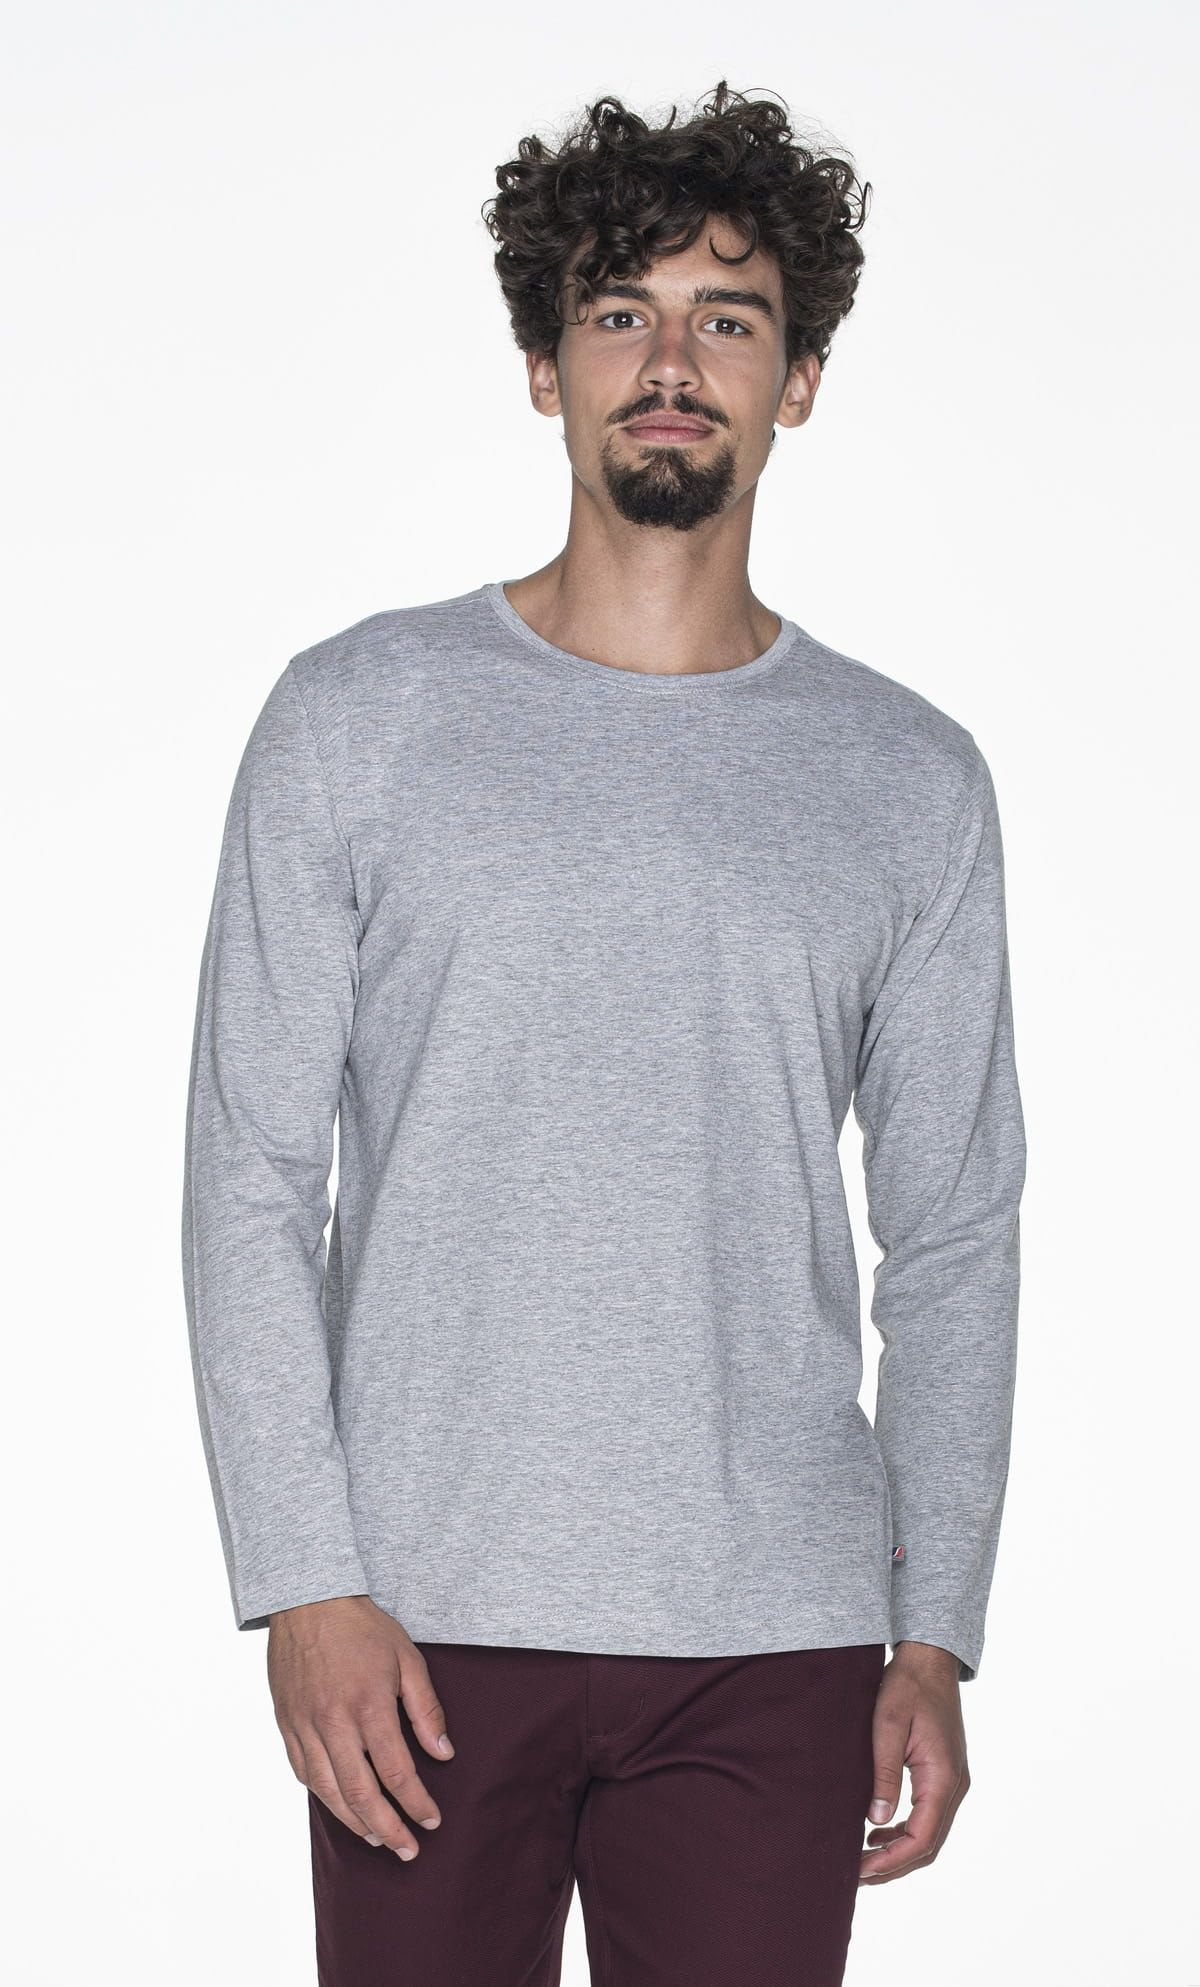 T-shirt mens voyage